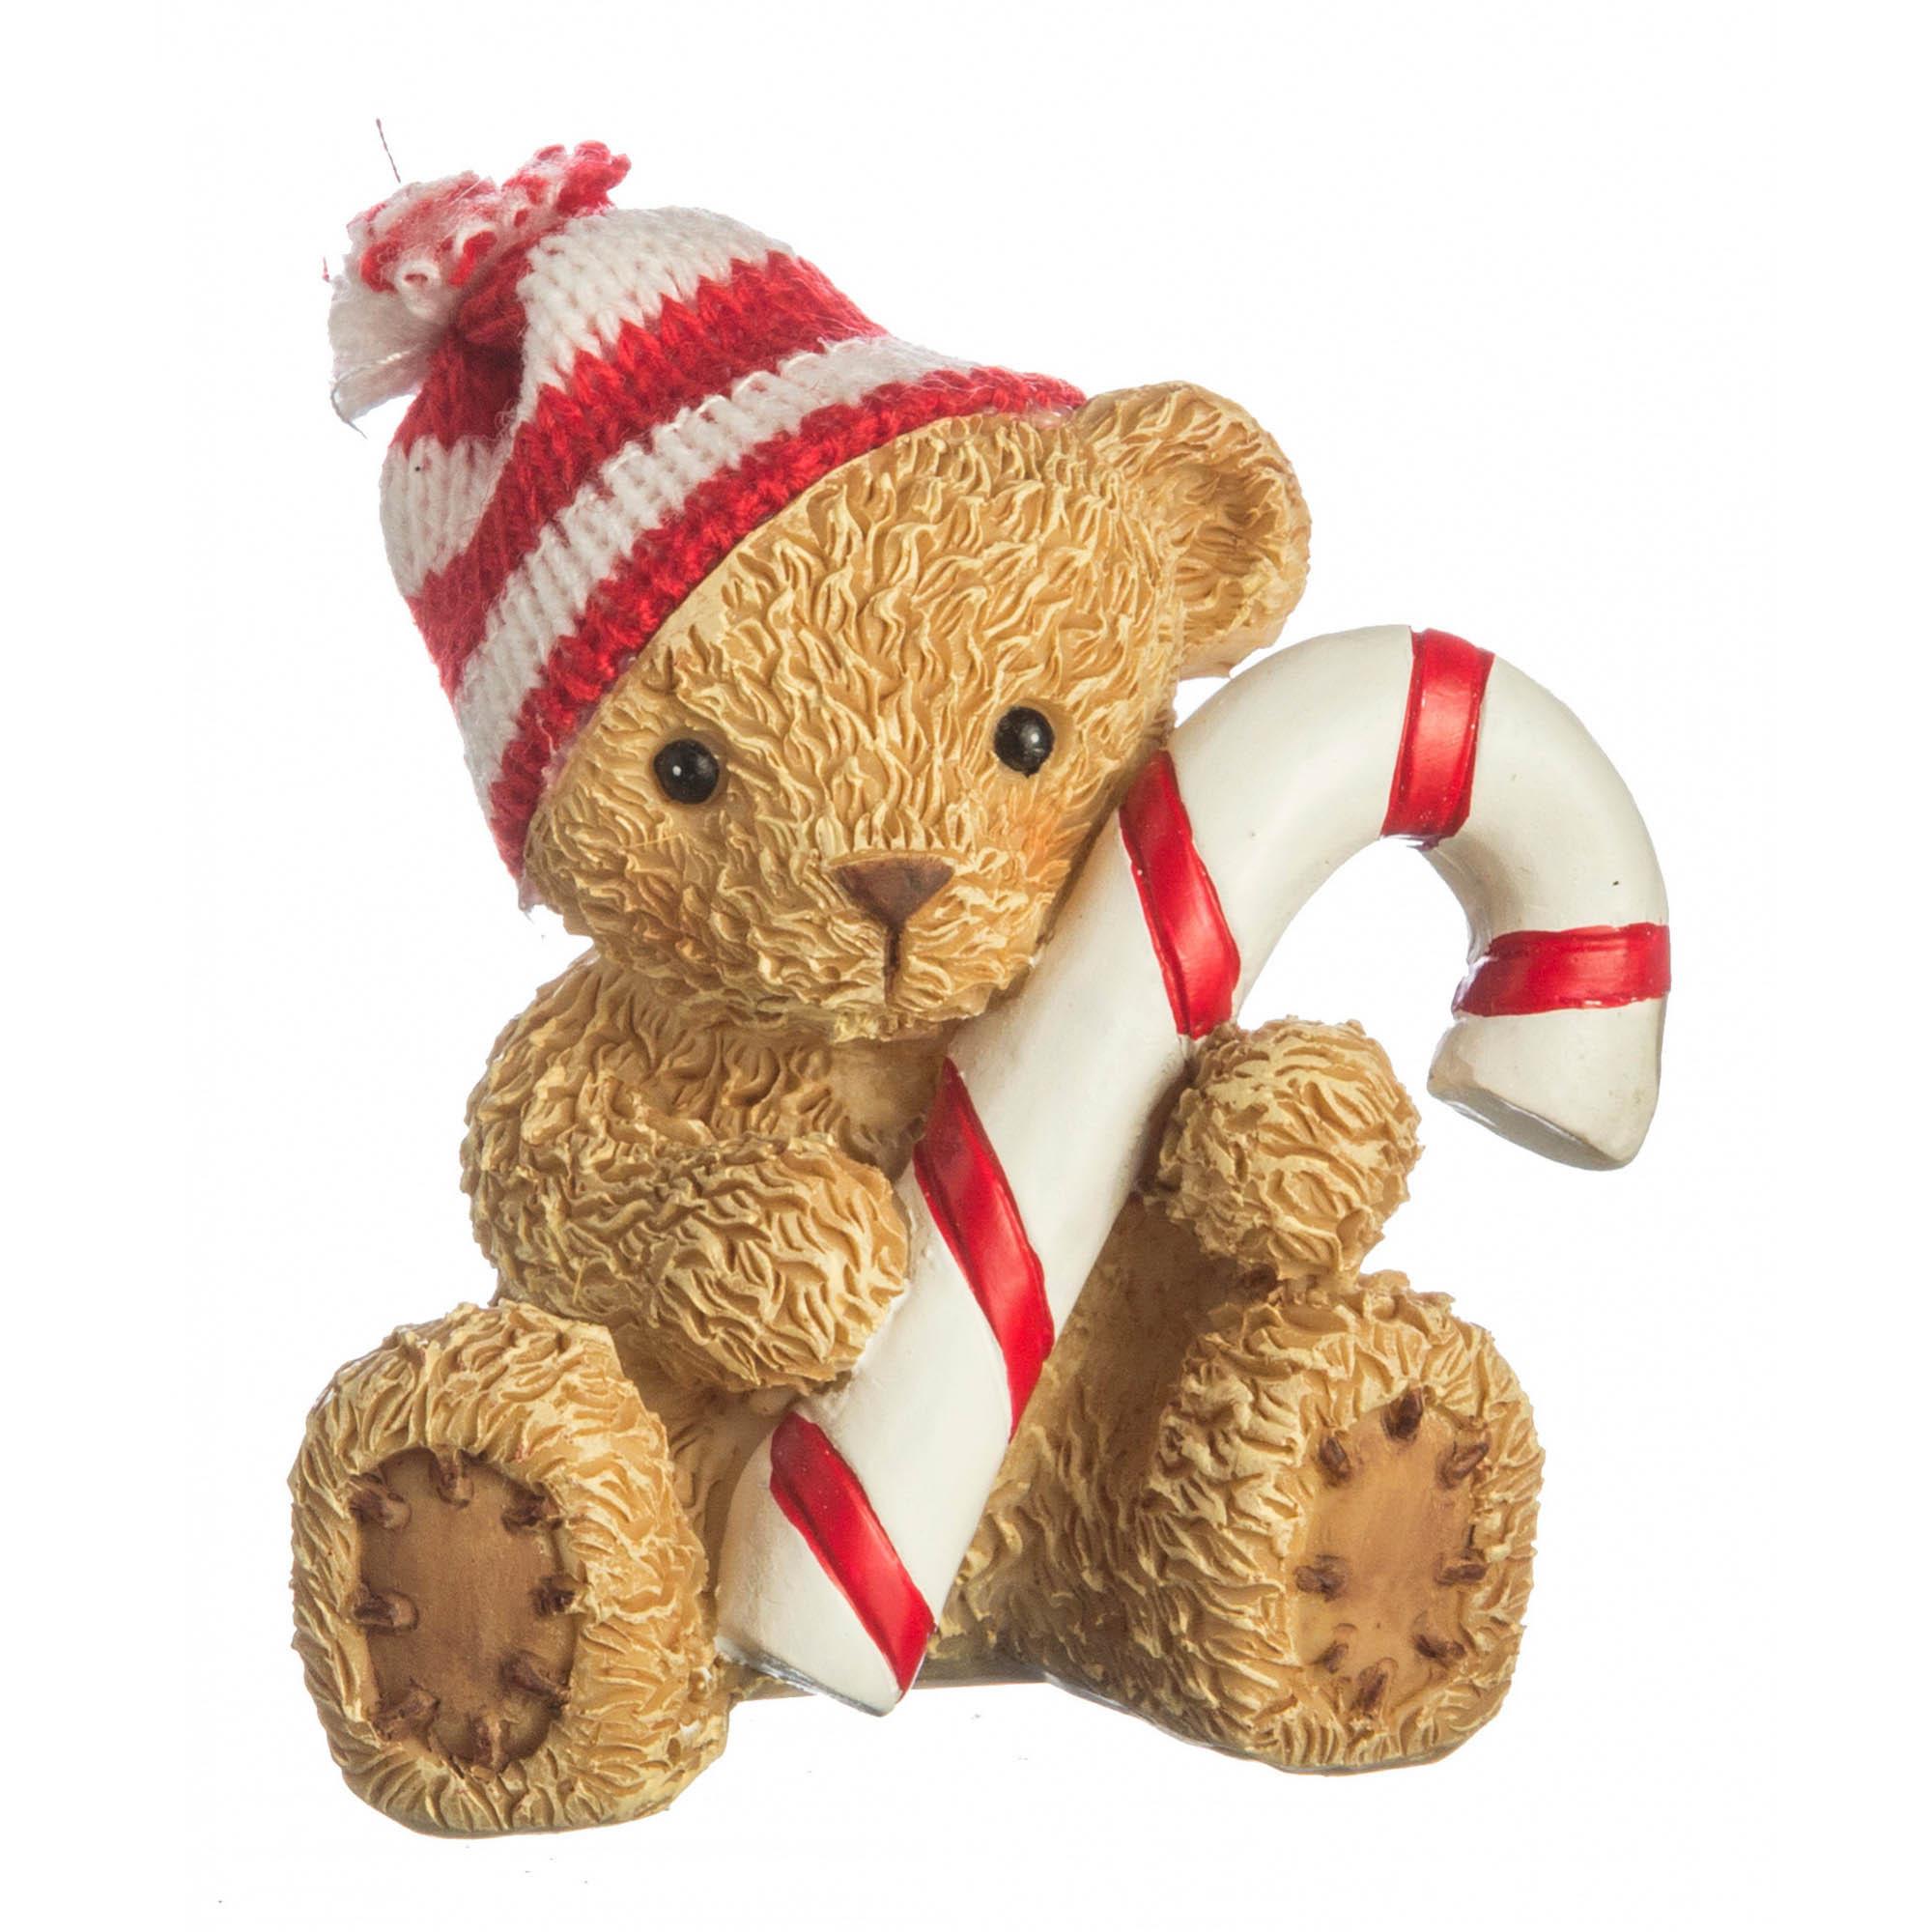 {} Lefard Интерьерная игрушка Медвежонок (5х8х9 см) lefard интерьерная игрушка jan 5х6х13 см